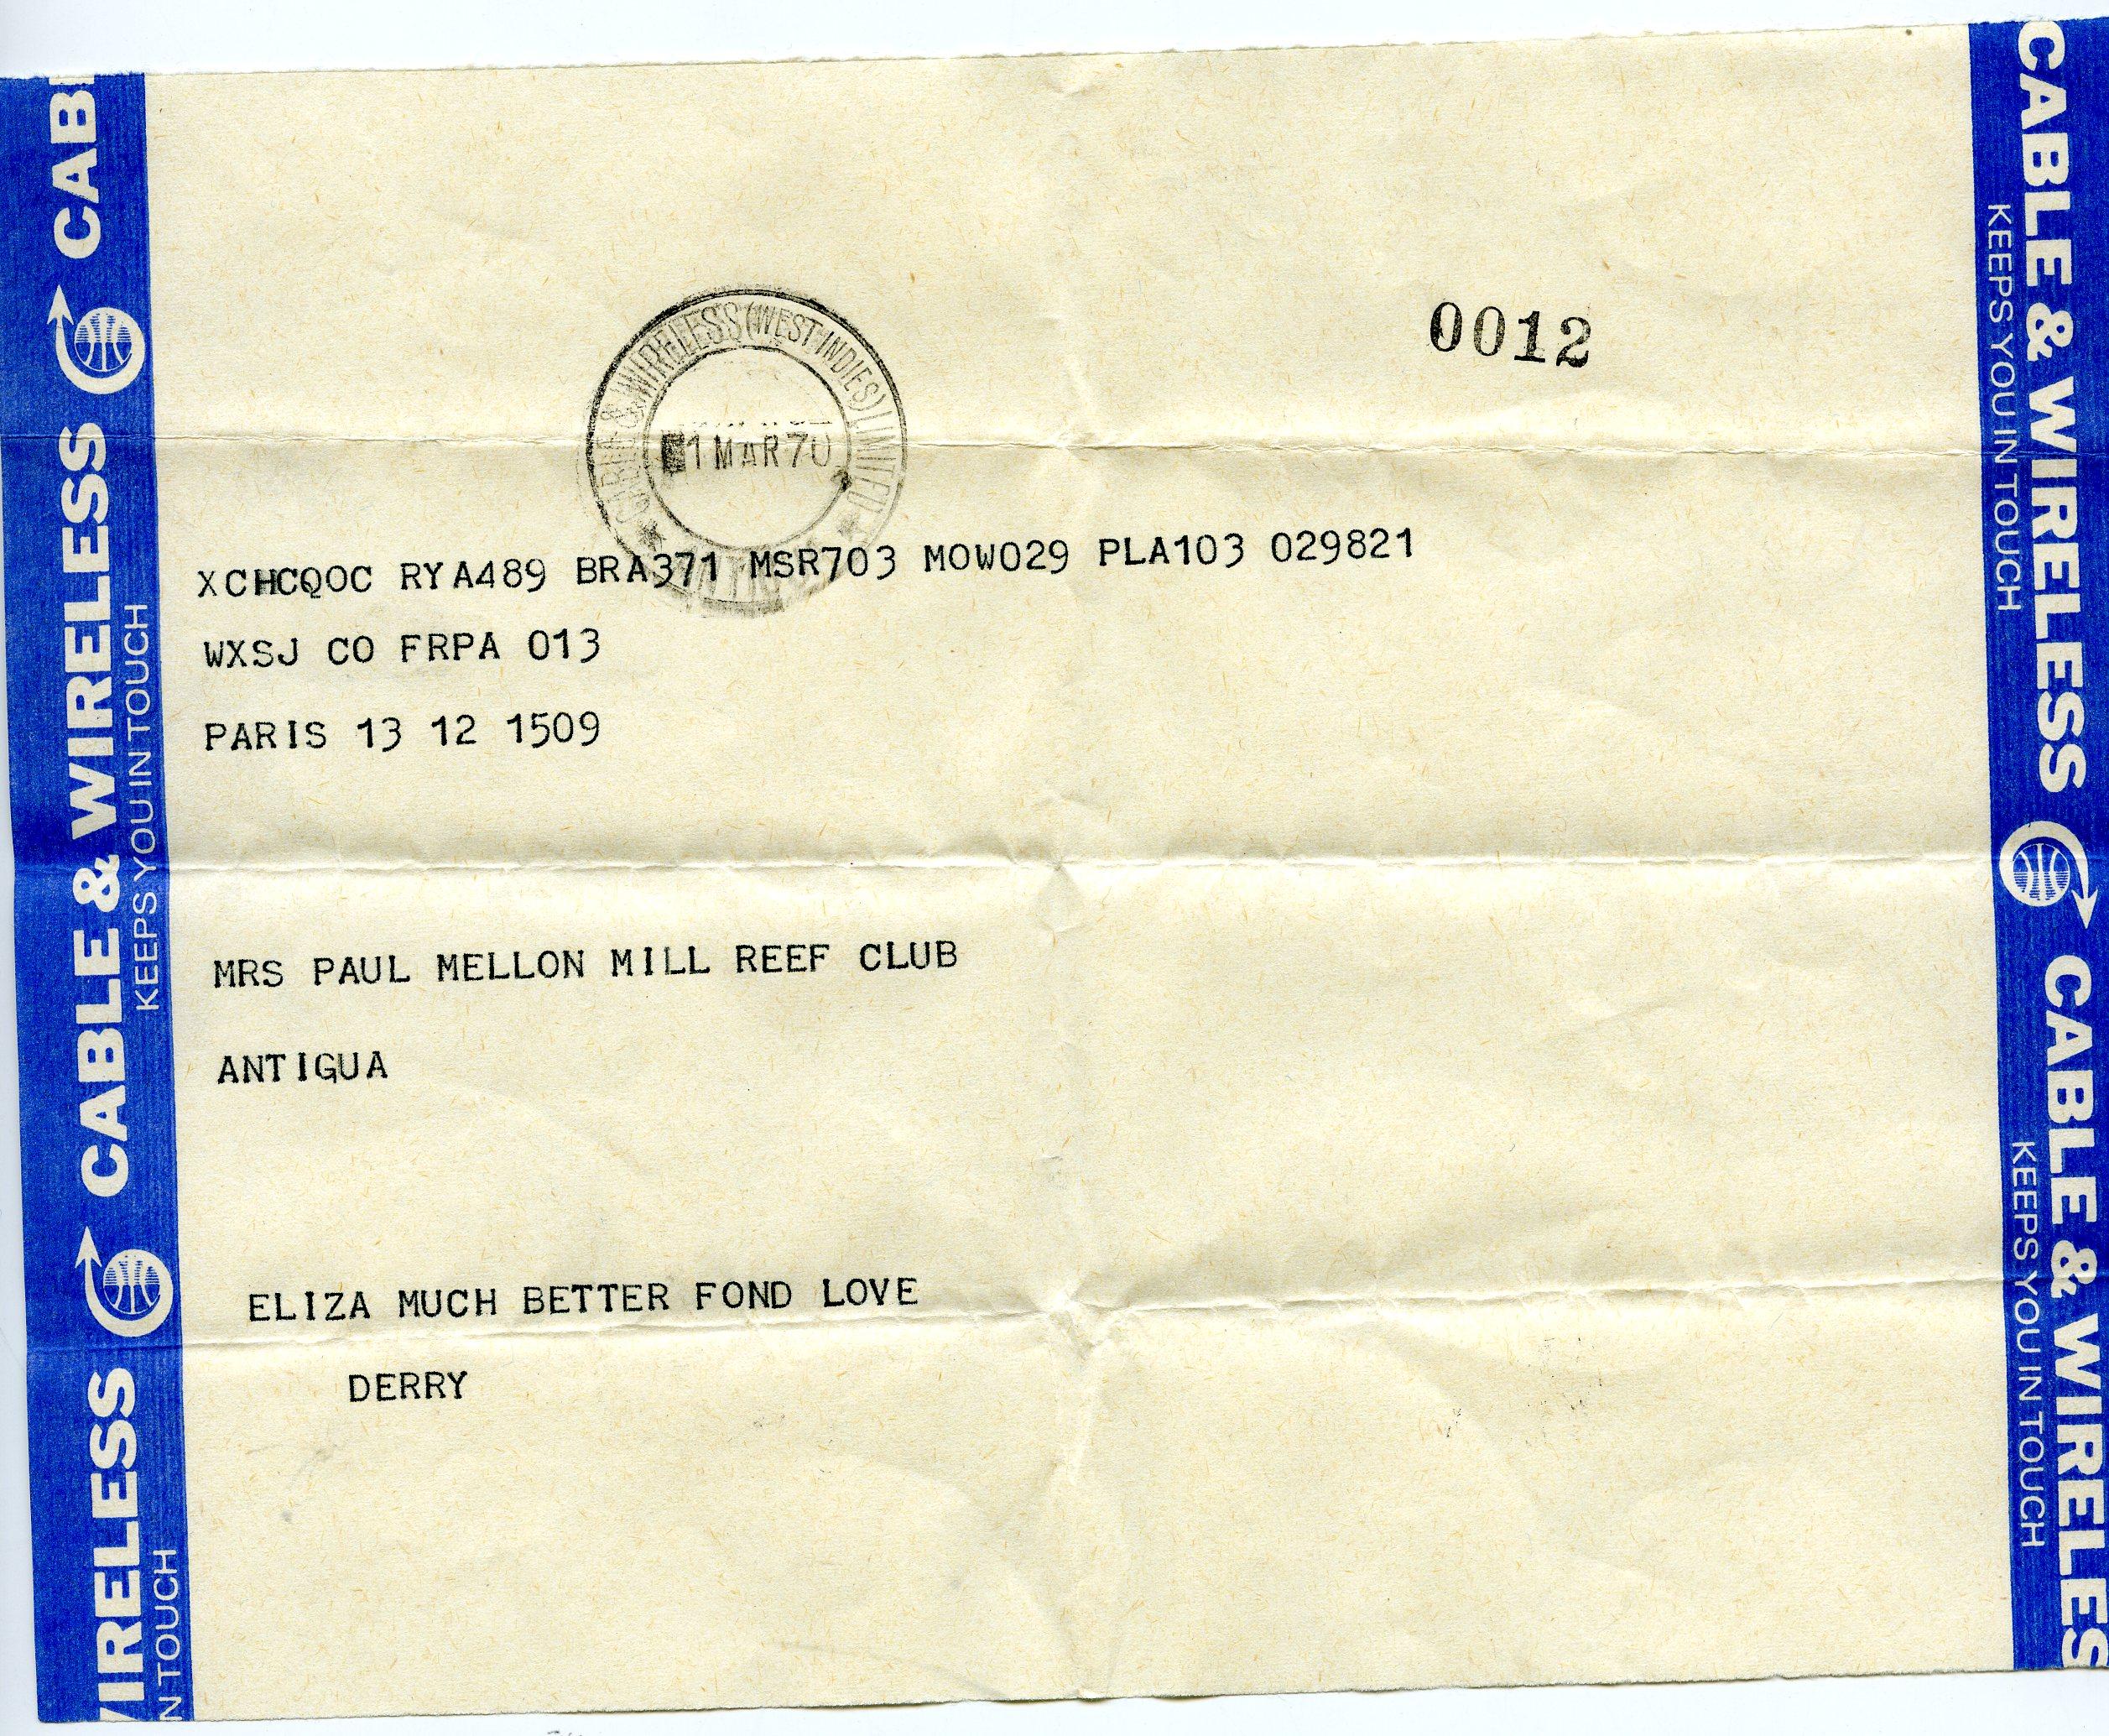 Telegrama de Mrs Paul Mellon